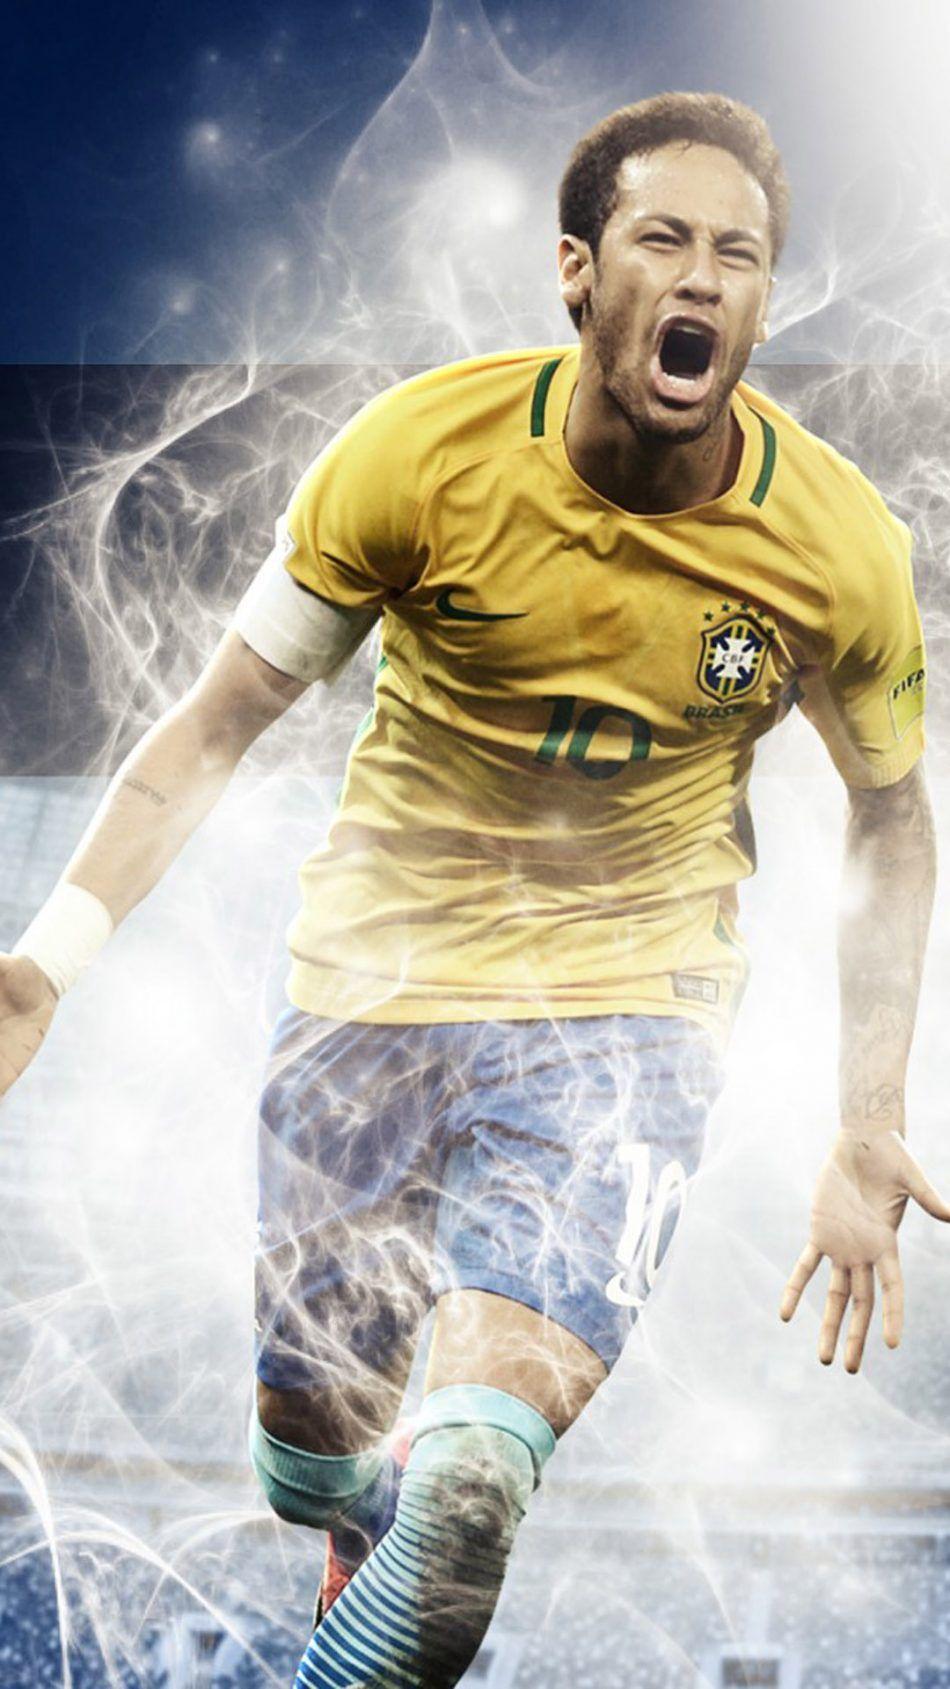 Neymar Brazil Fifa World Cup 2018 4k Ultra Hd Mobile Wallpaper Neymar Brazil Neymar Fifa